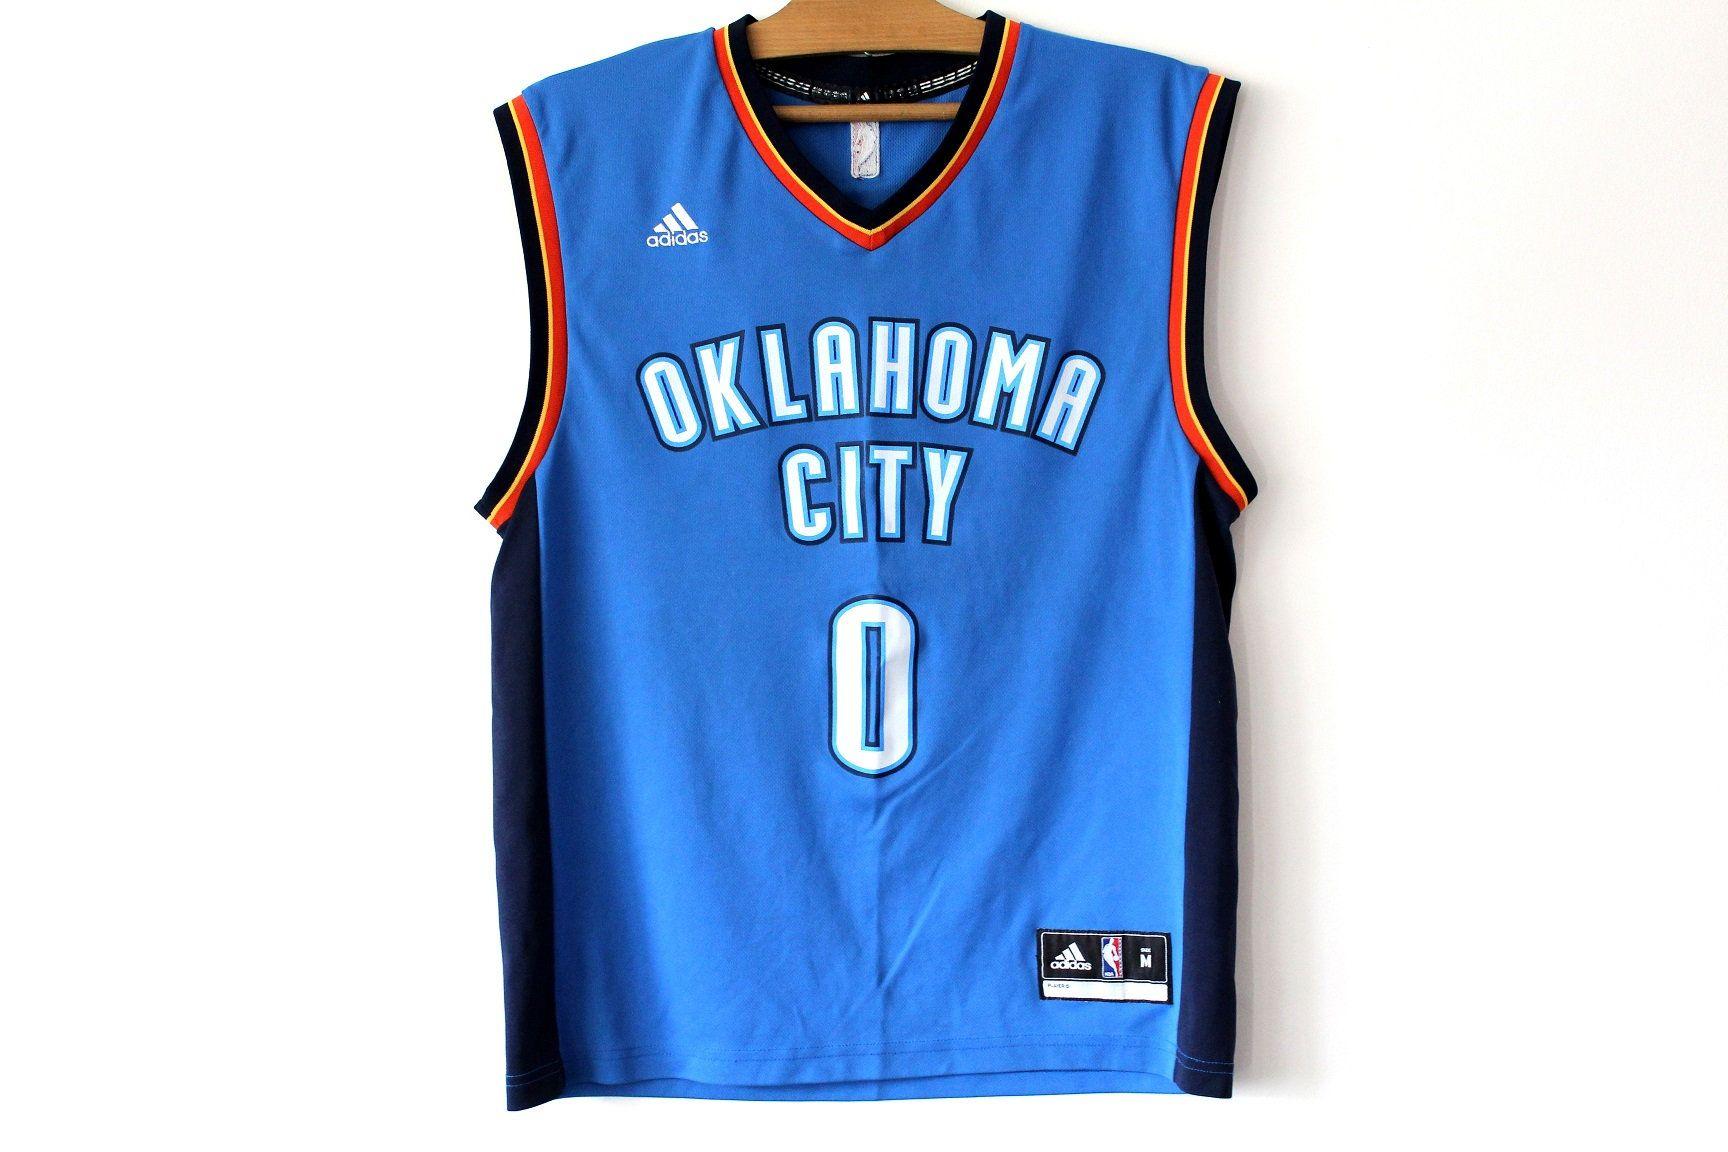 Blue Adidas Jersey, Vintage NBA Jersey, Basketball Jersey, Sports ...